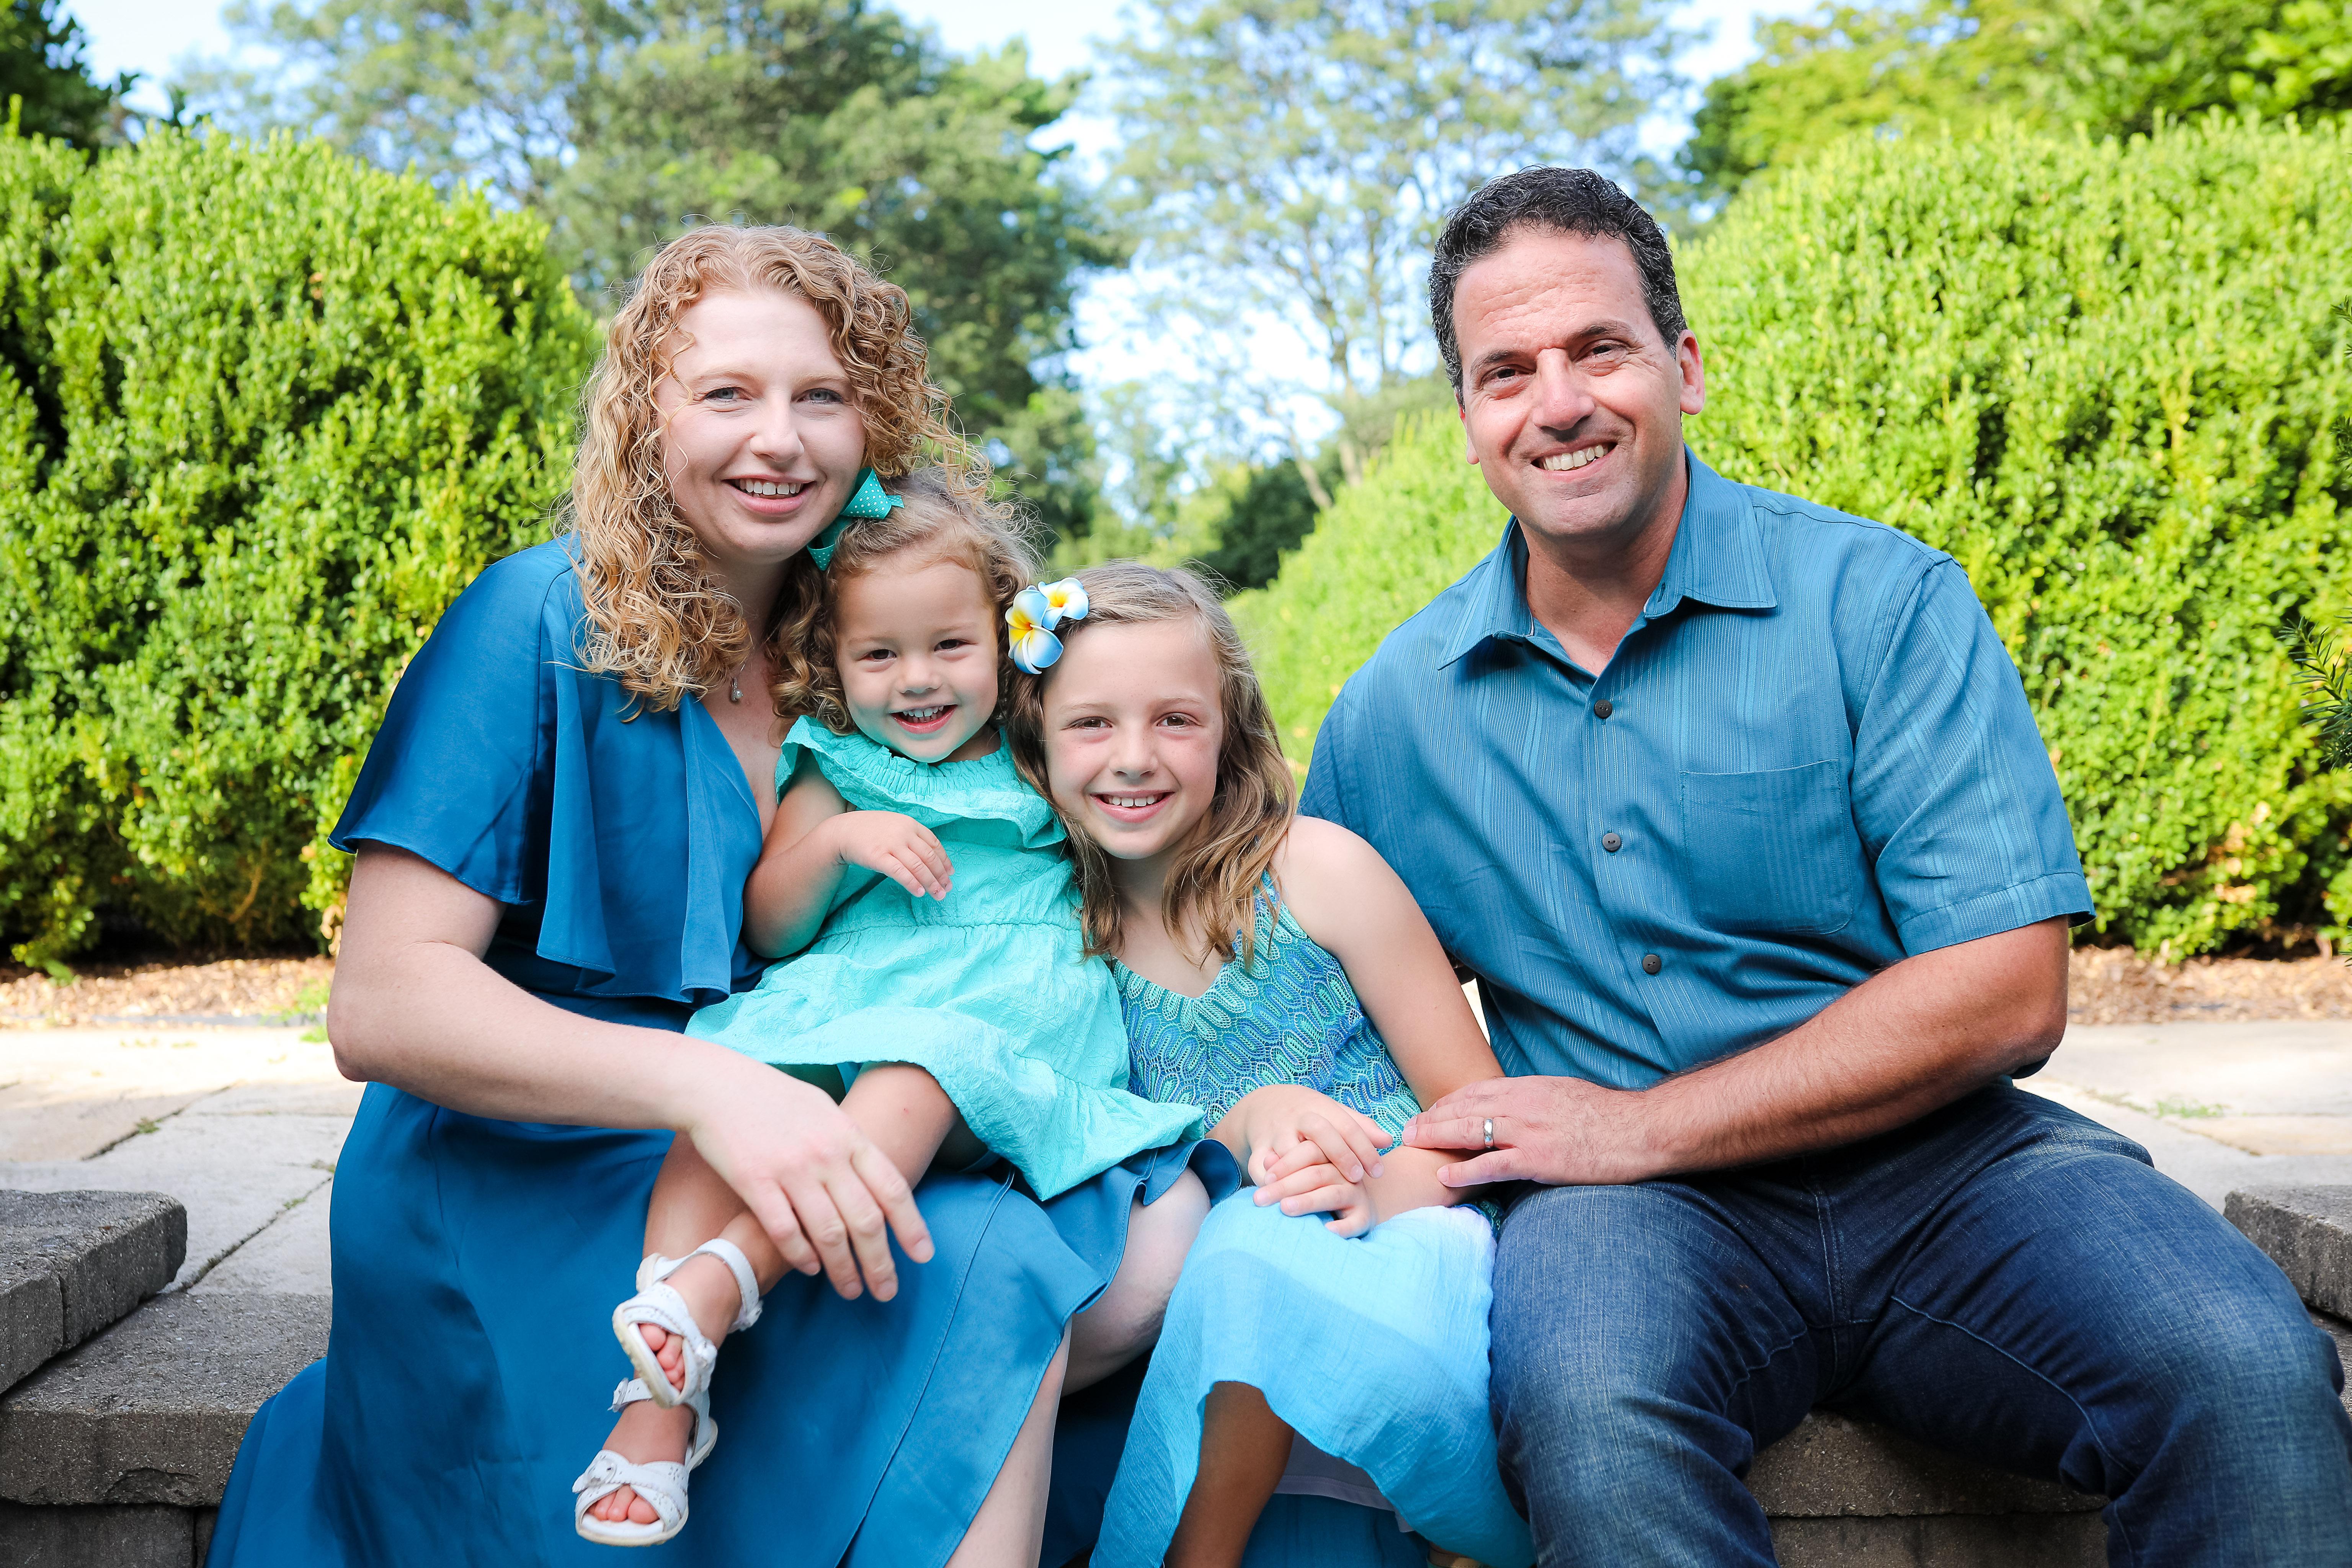 BecciHethcoatPhotography-Family Photographer-Wheaton-35.jpg